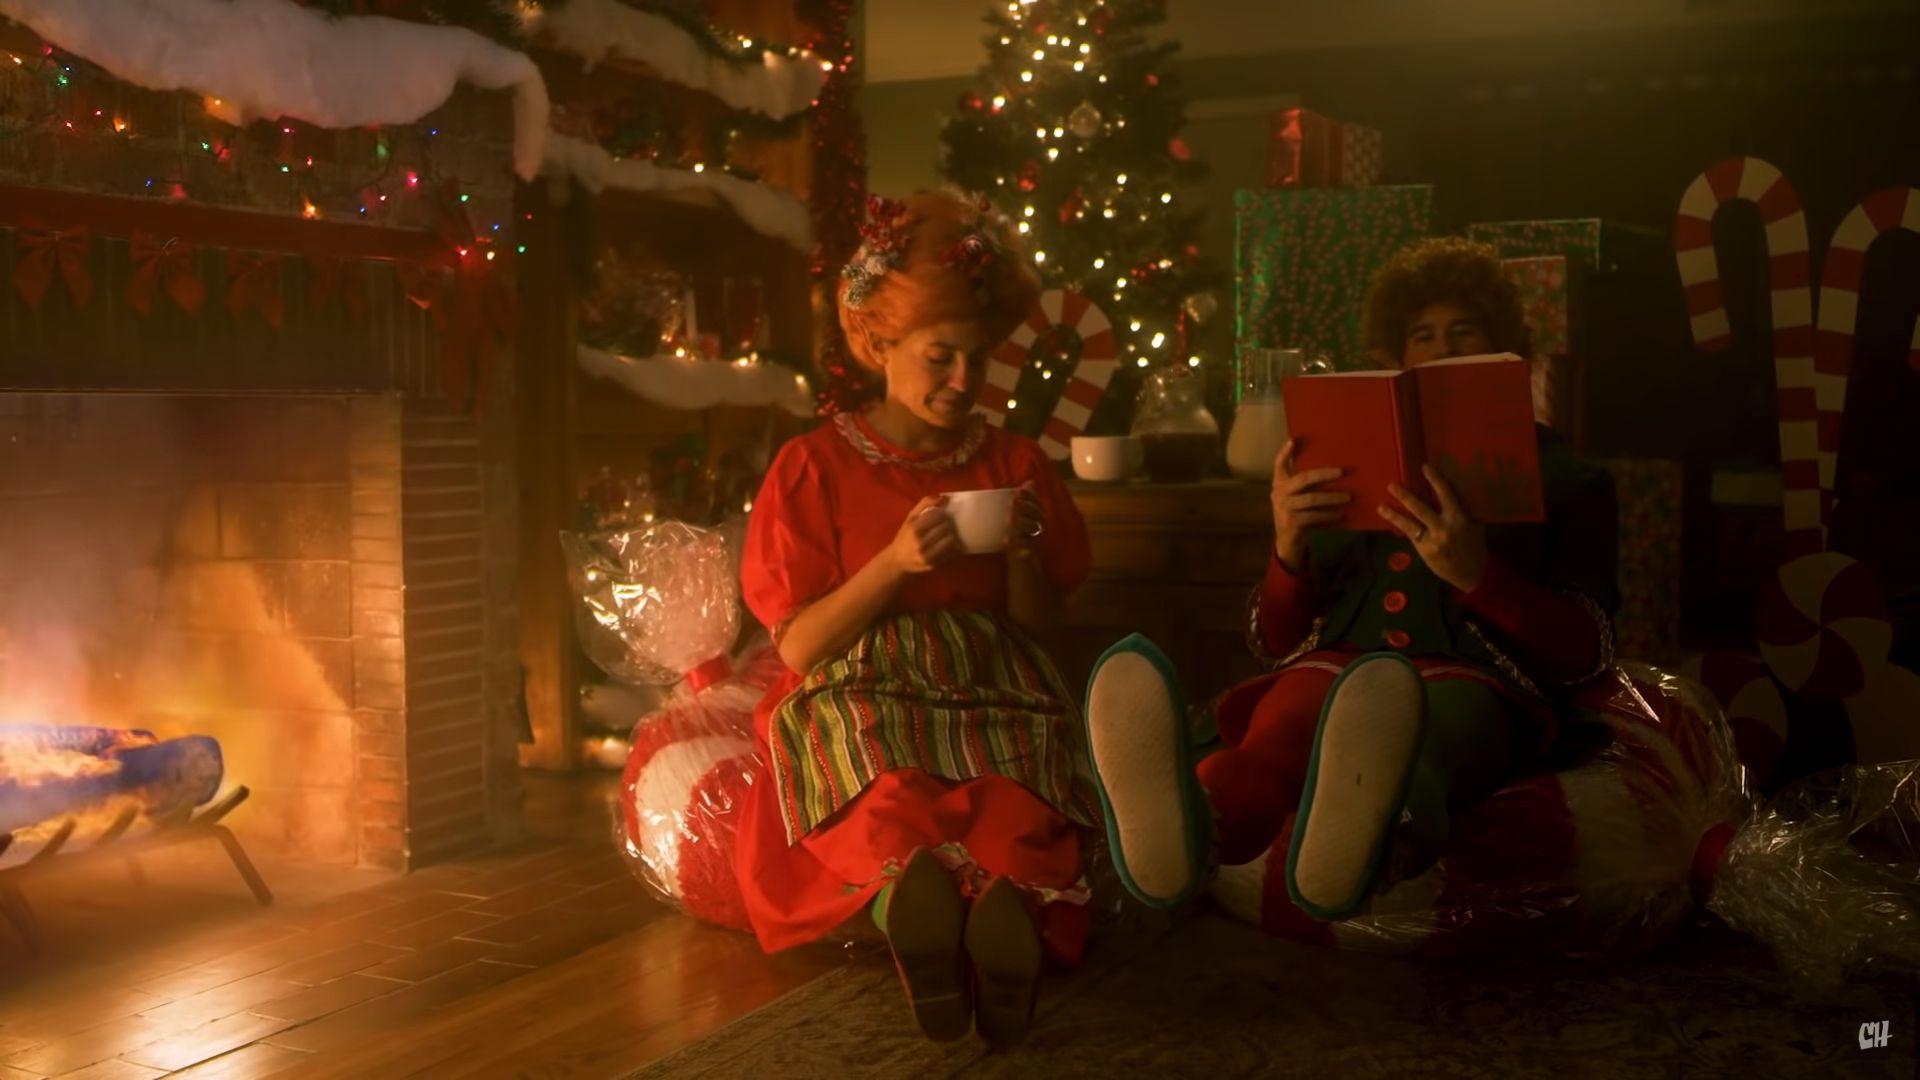 Christmas Elves Vs Fantasy Elves Comedy Sketch Illustrates Awkward Holiday Family Conversations Geektyrant